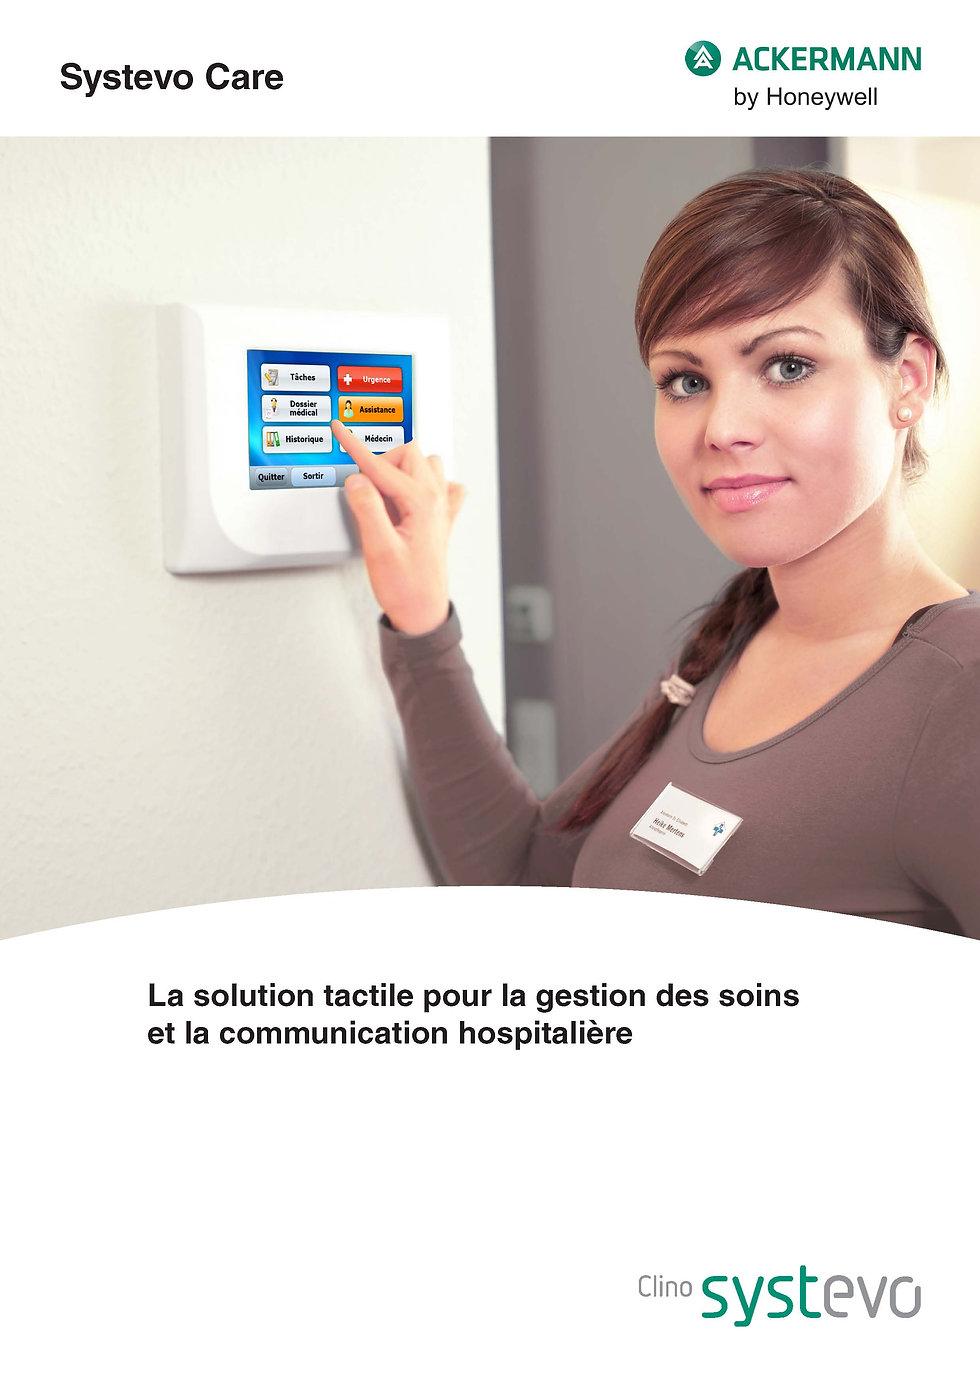 Systevo Care , Ackermann , gestion des soins ,communication hospitalière ,Appel malade